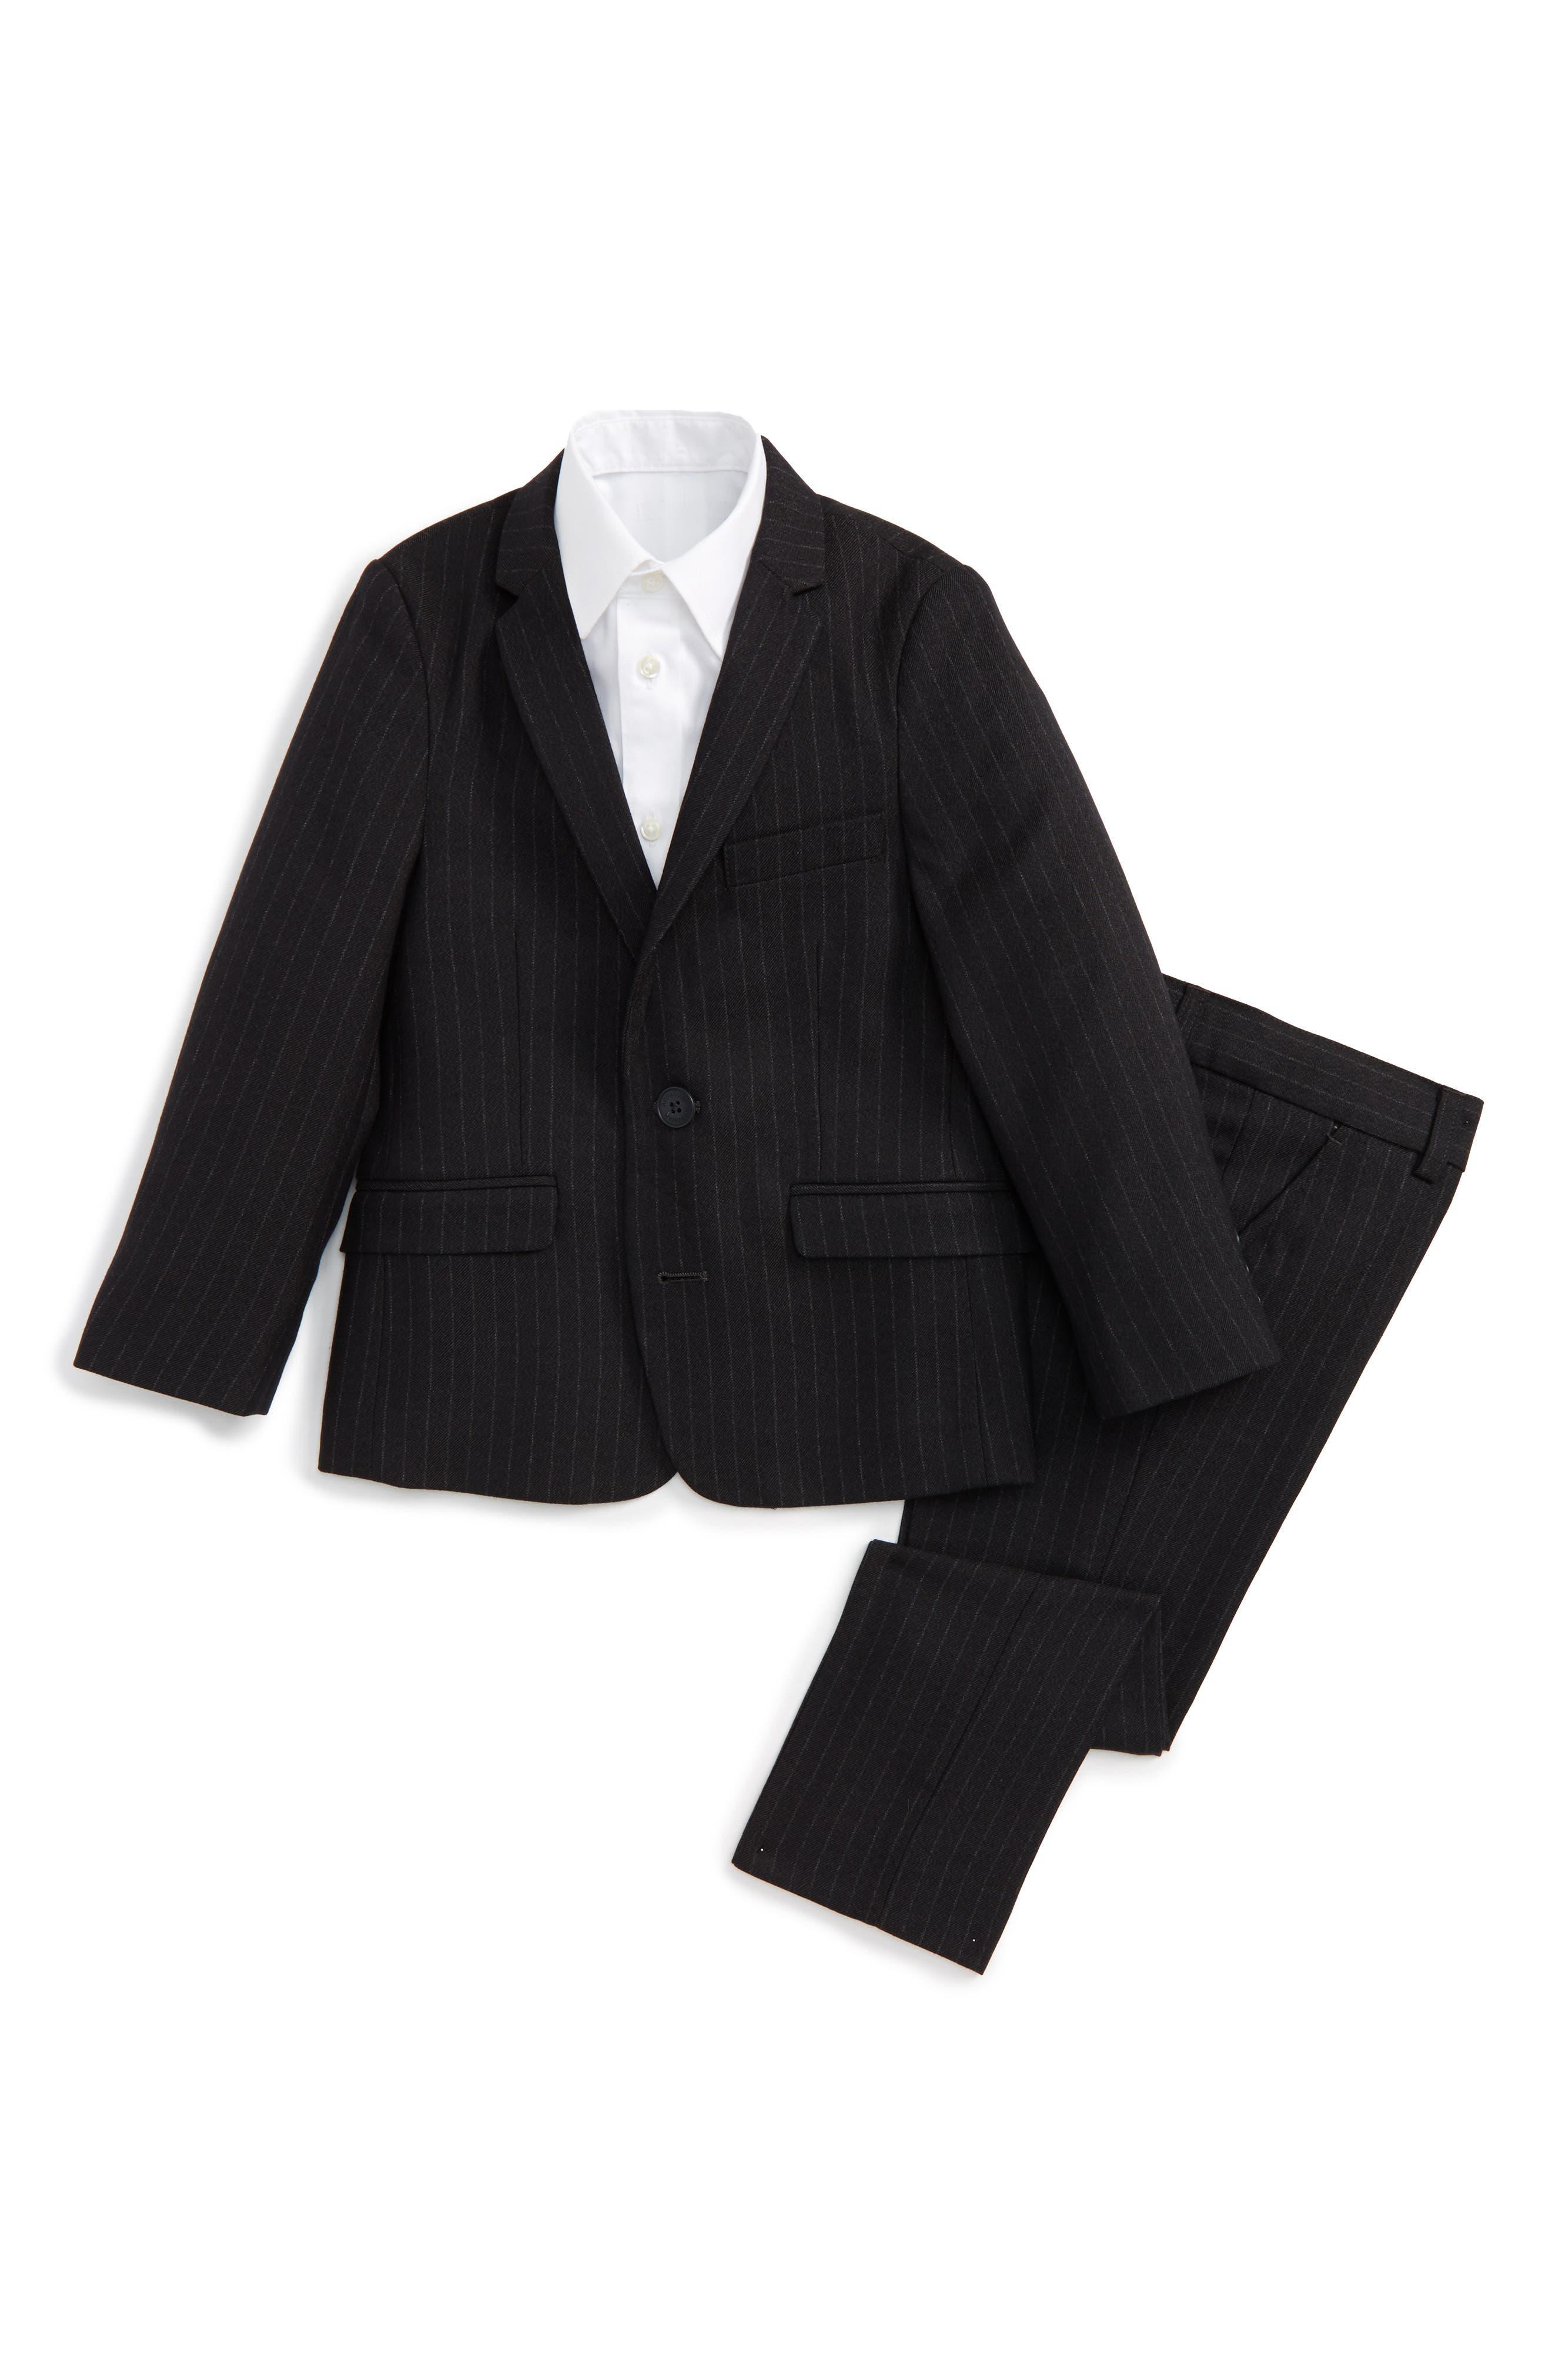 APPAMAN Mod Pinstripe Suit